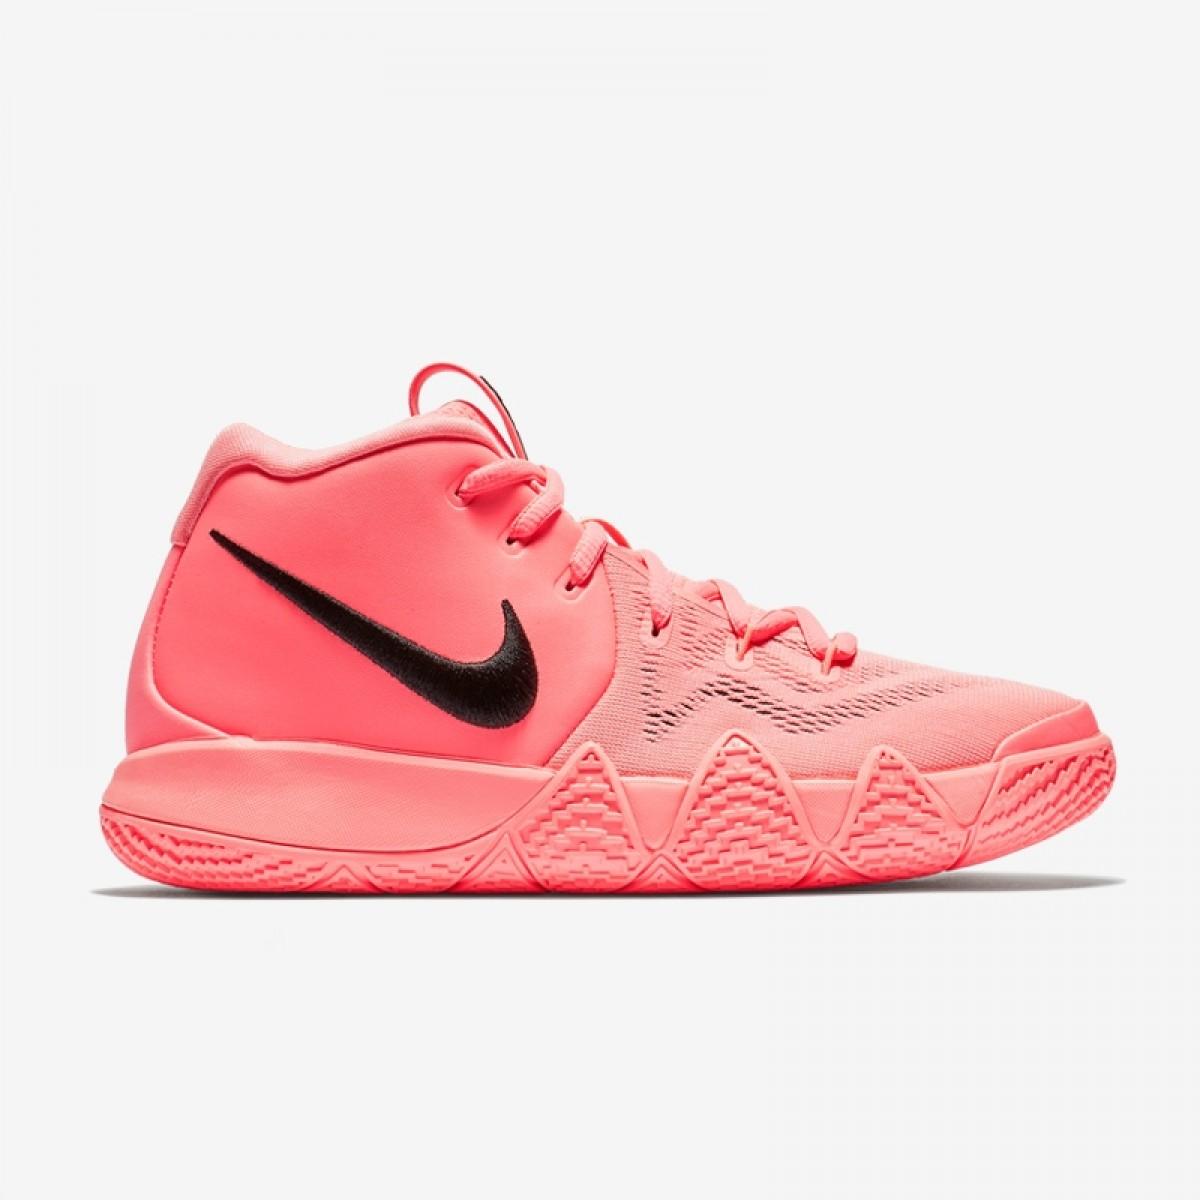 punto No complicado Vástago  Buy Nike Kyrie 4 GS 'Atomic Pink' Basketball shoes & sneakers